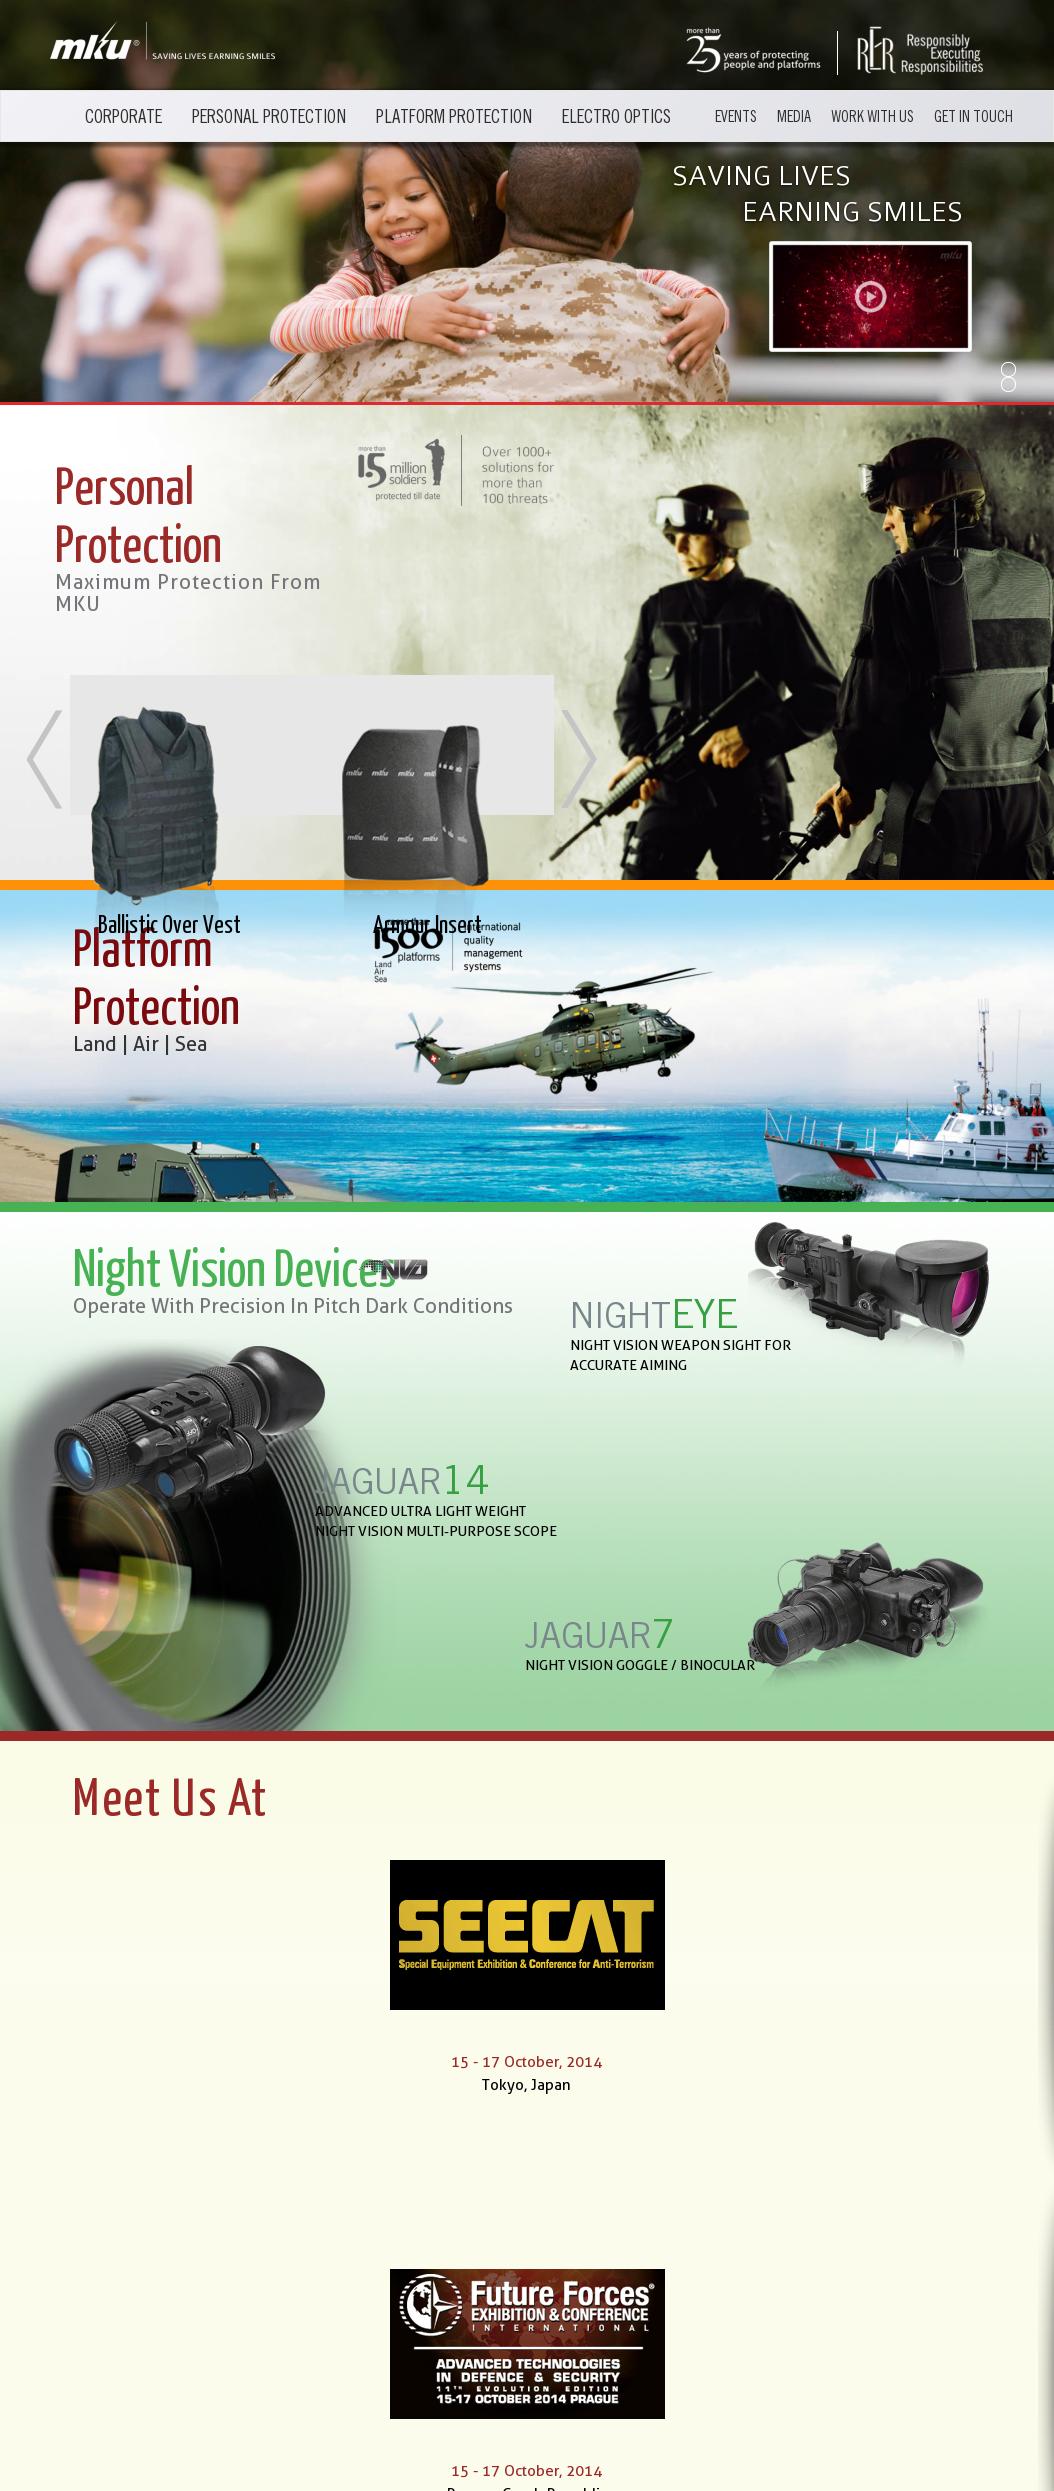 Owler Reports - Press Release: MKU : Advanced Gas Piston